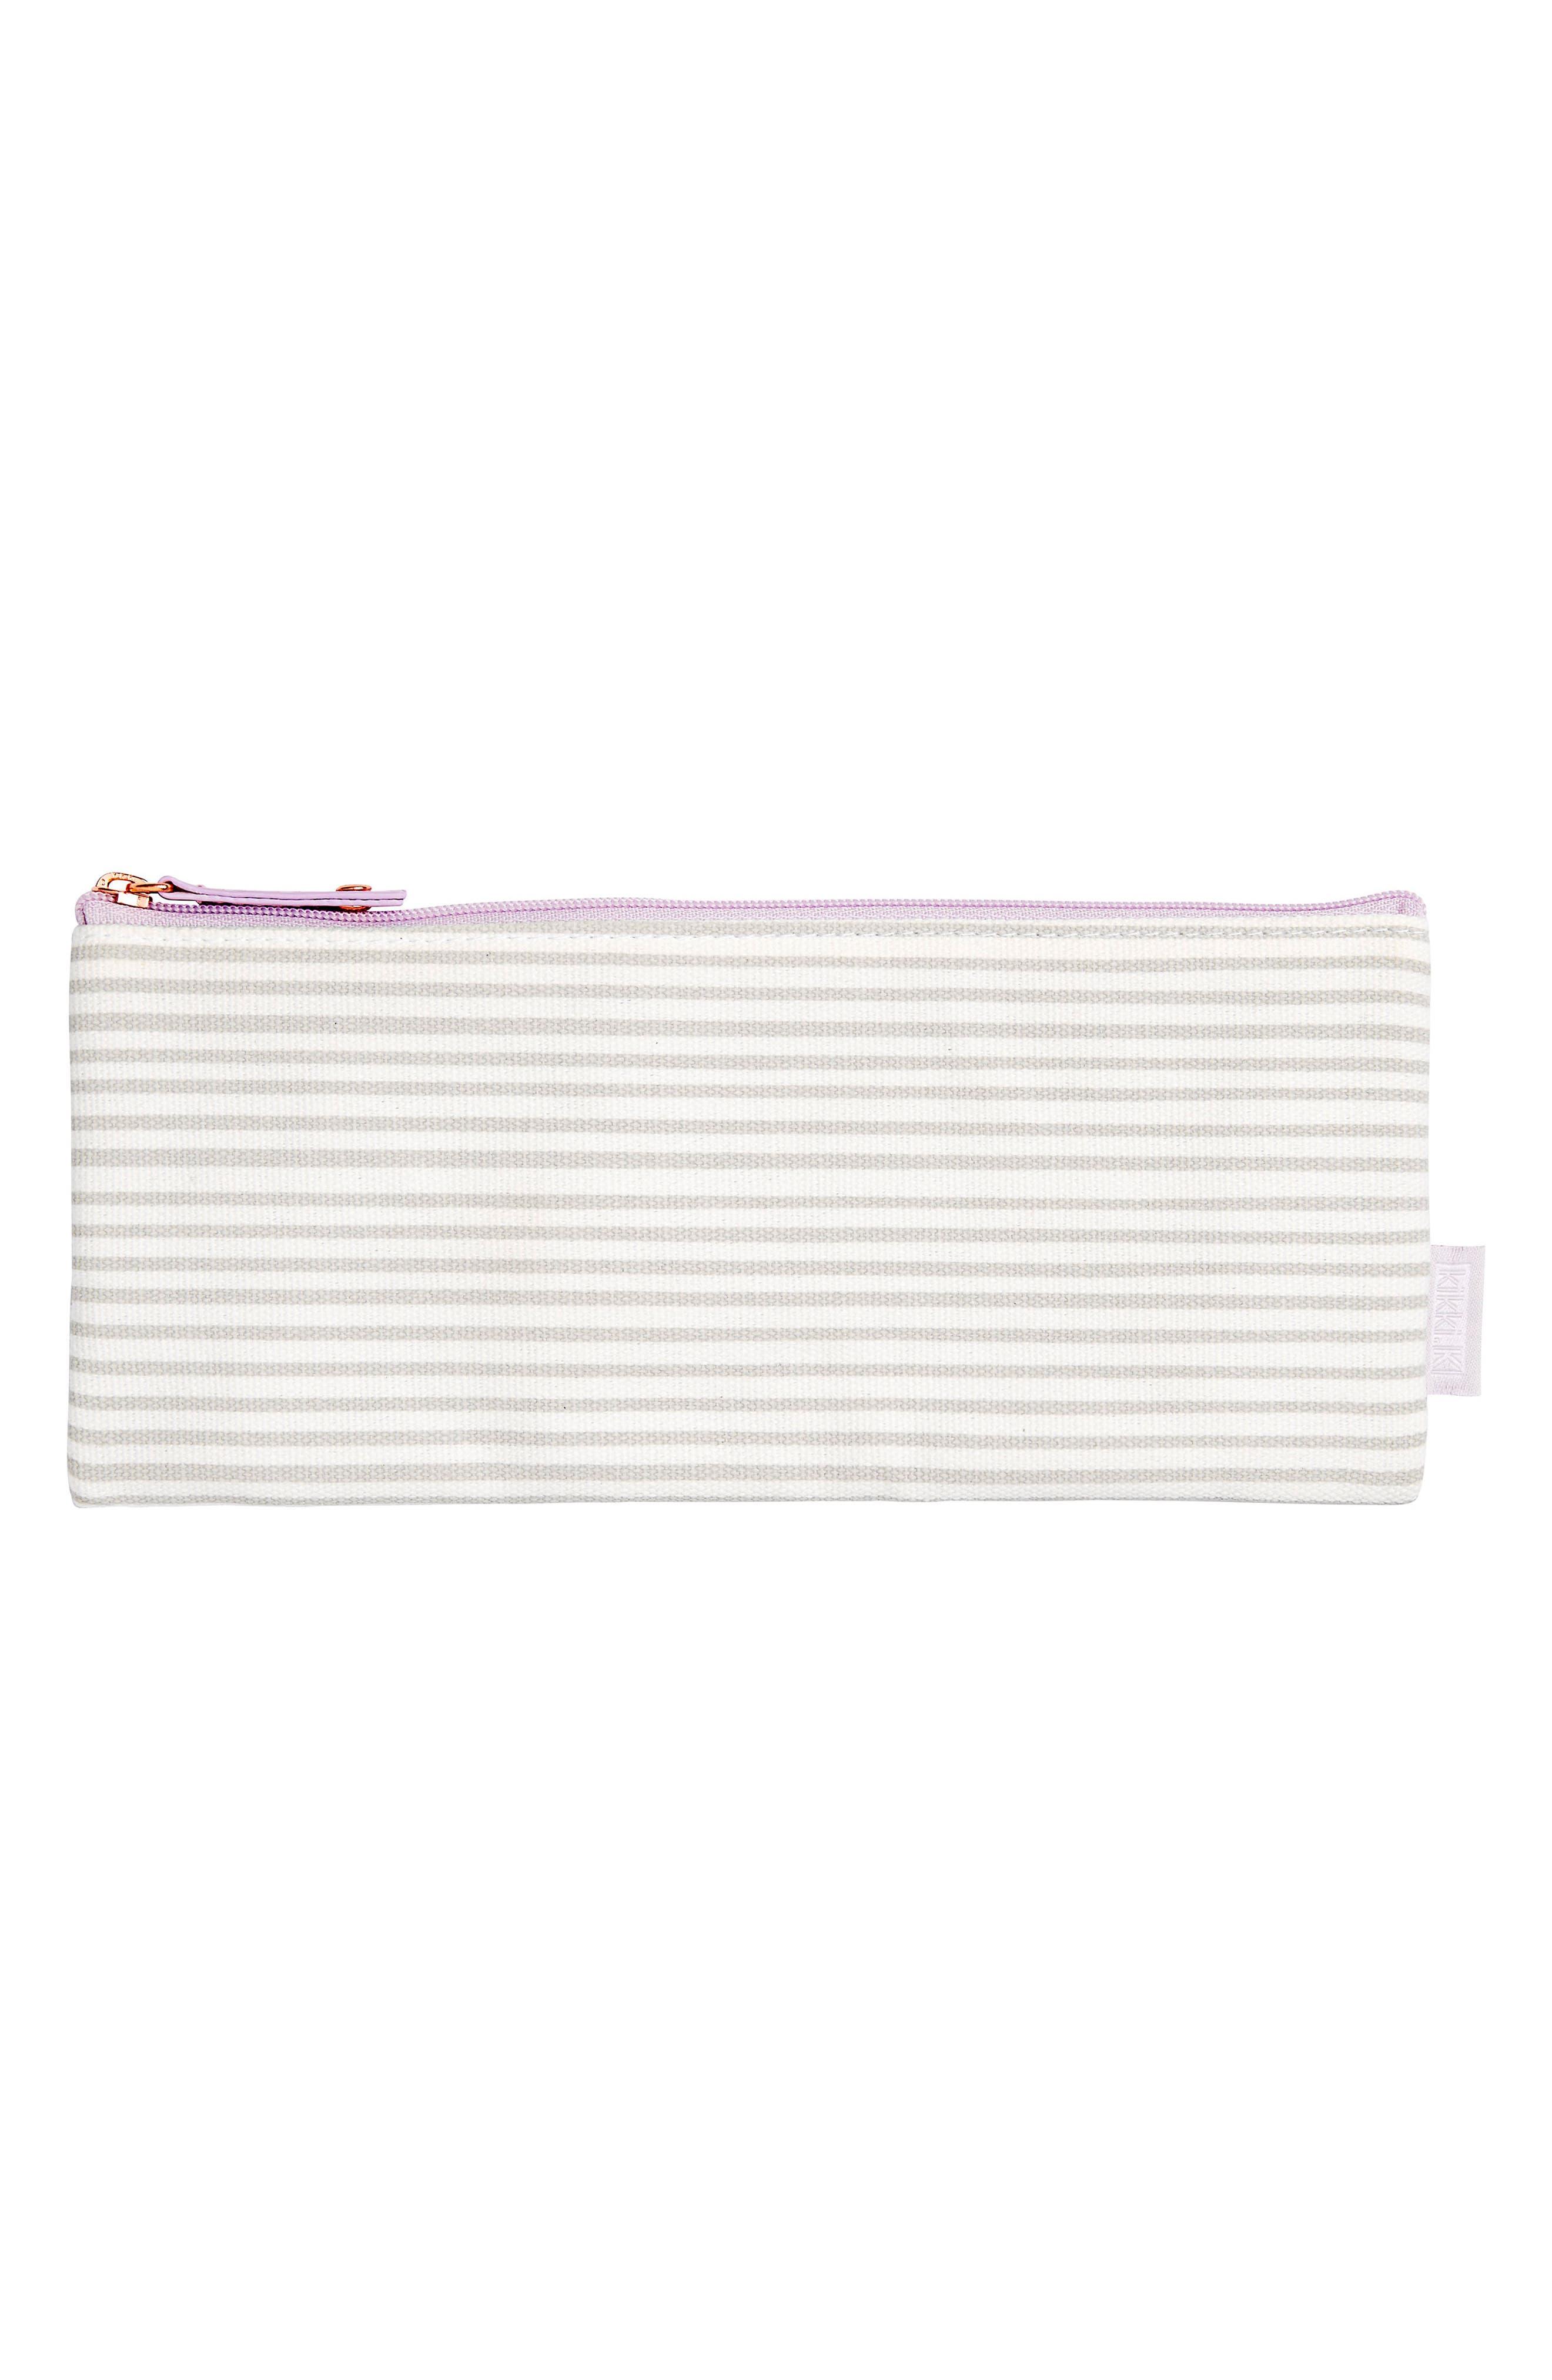 kikki.K Stripe Canvas Pencil Case